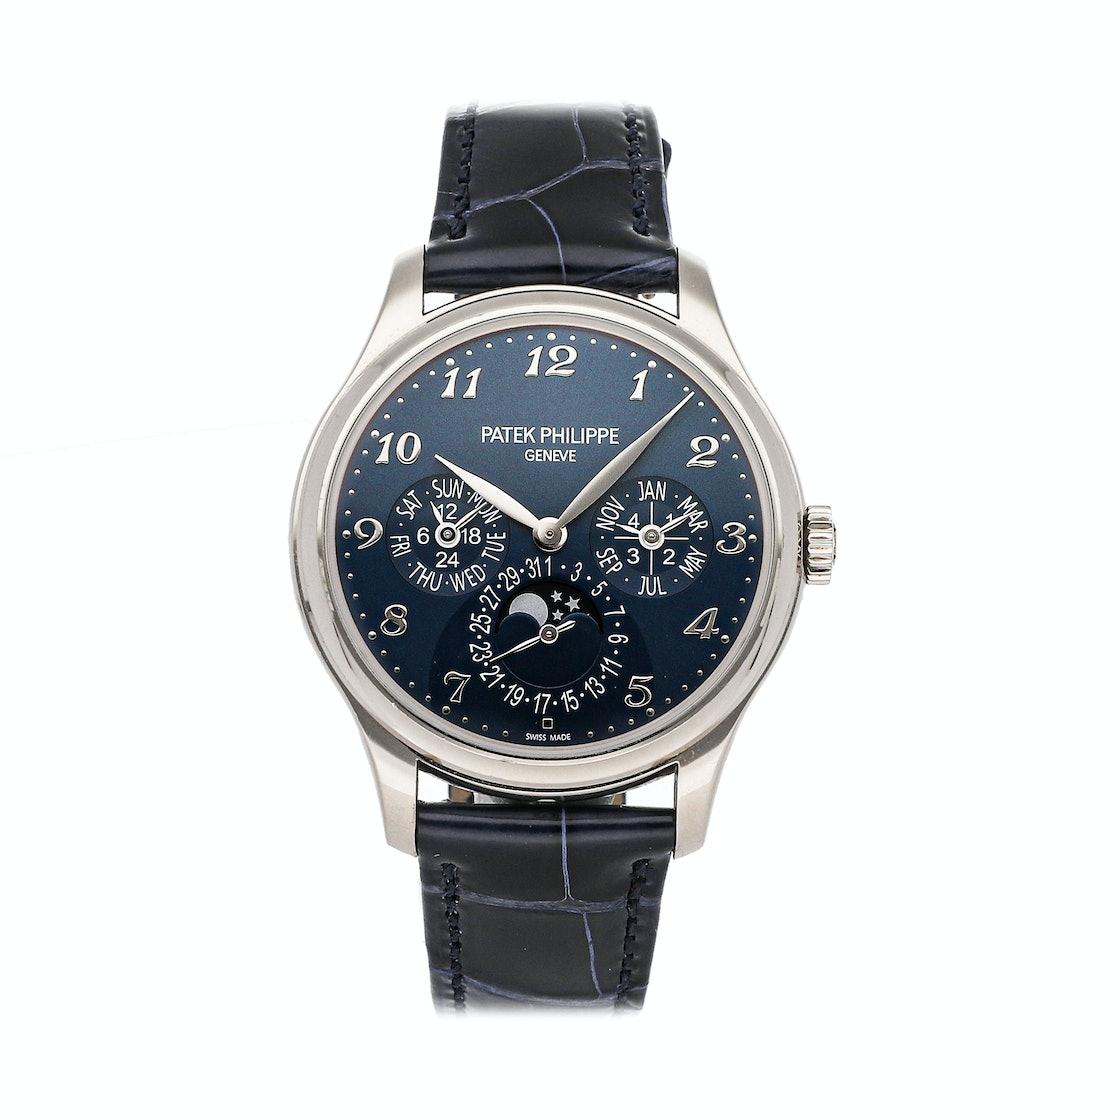 Patek Philippe Grand Complications Perpetual Calendar 5327G-001